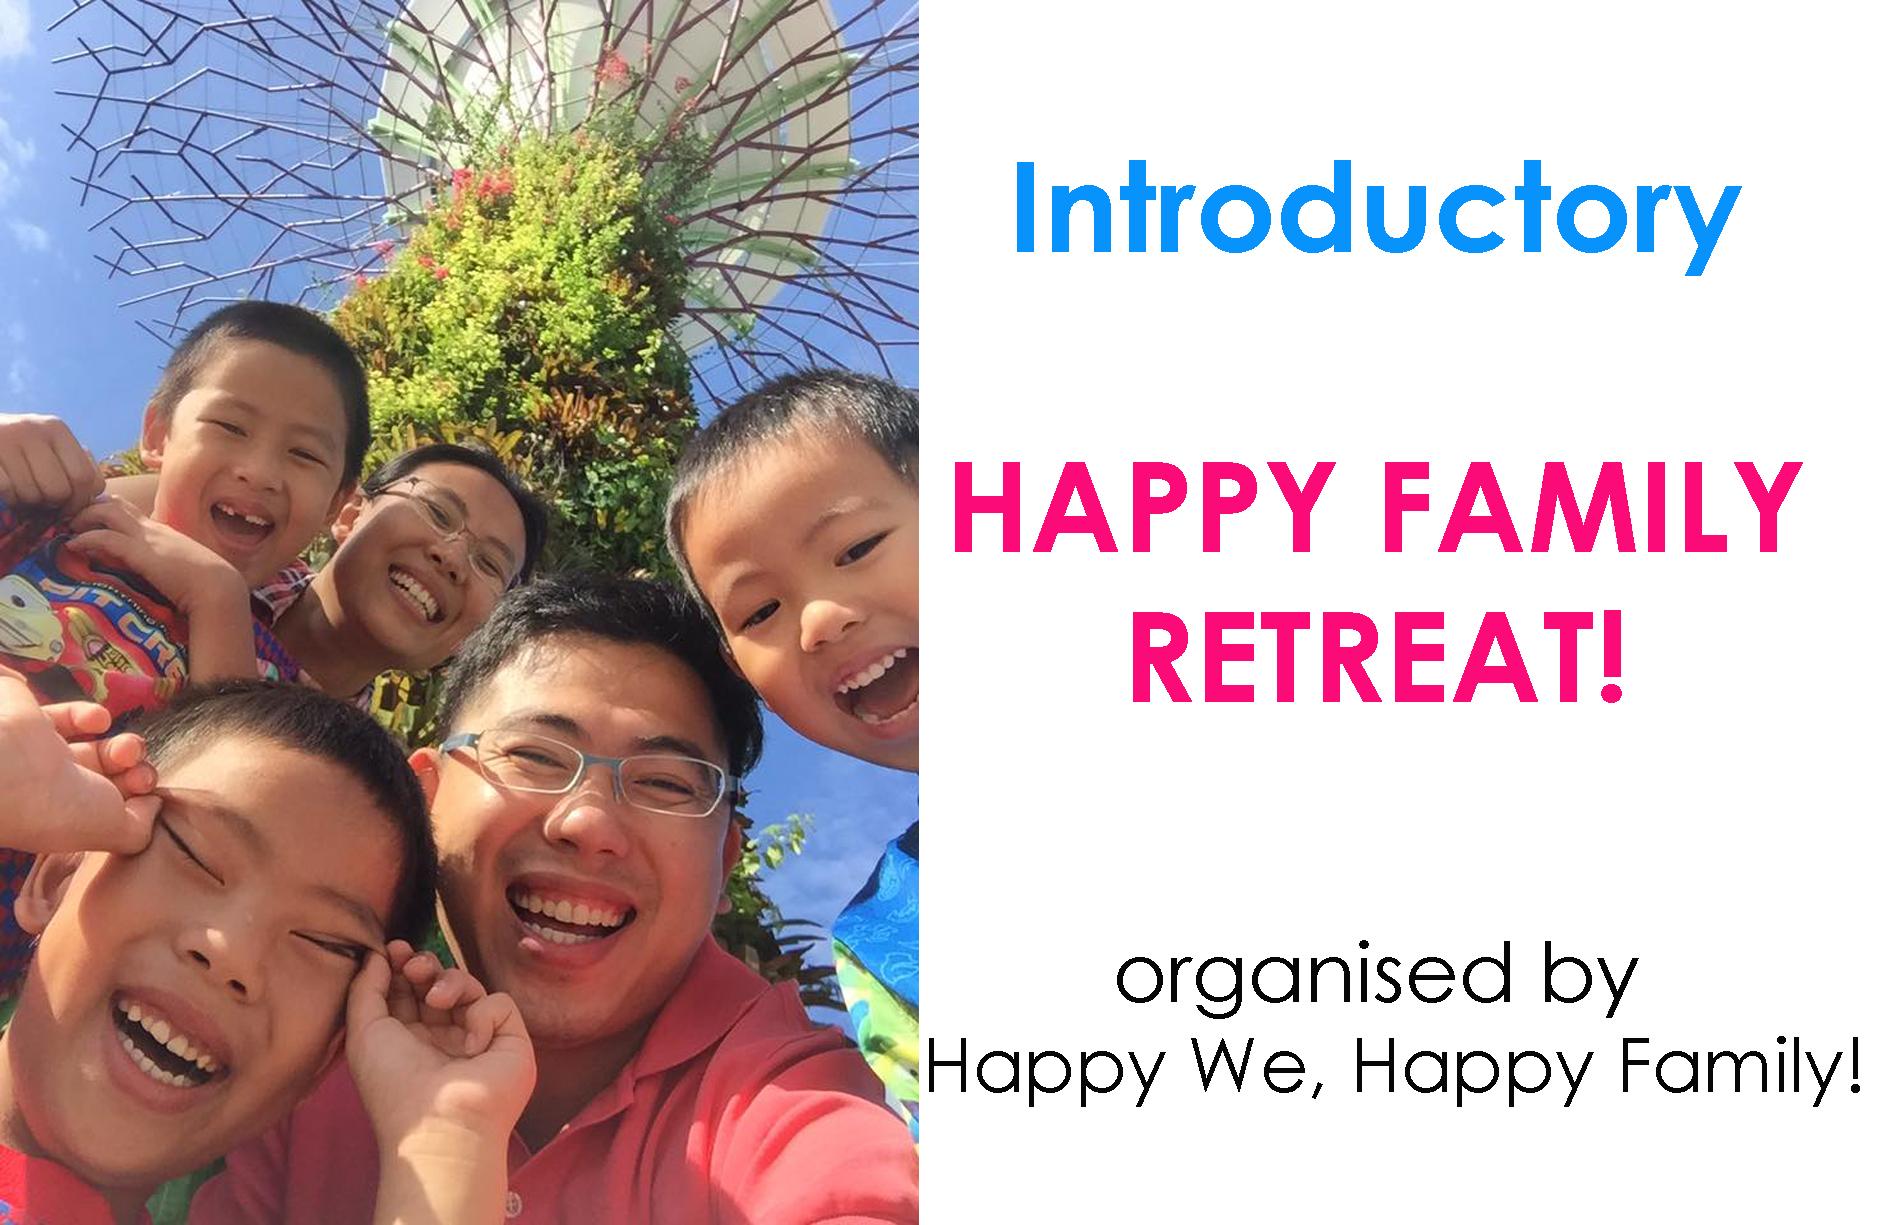 Happy Family Retreat